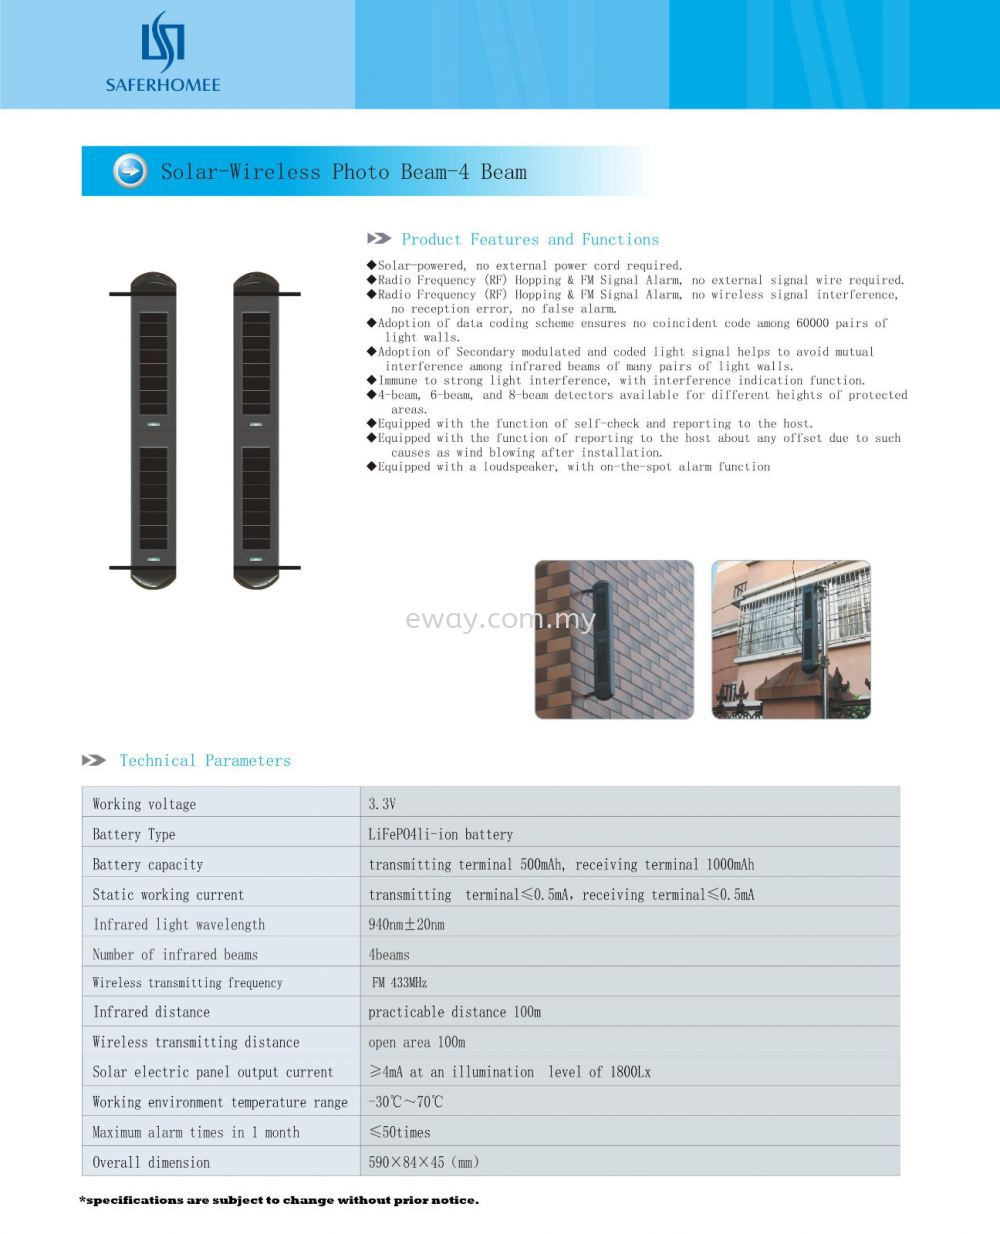 Solar-Wireless PhotoBeam-4 Beam Sensor - Catalogue Accessories for